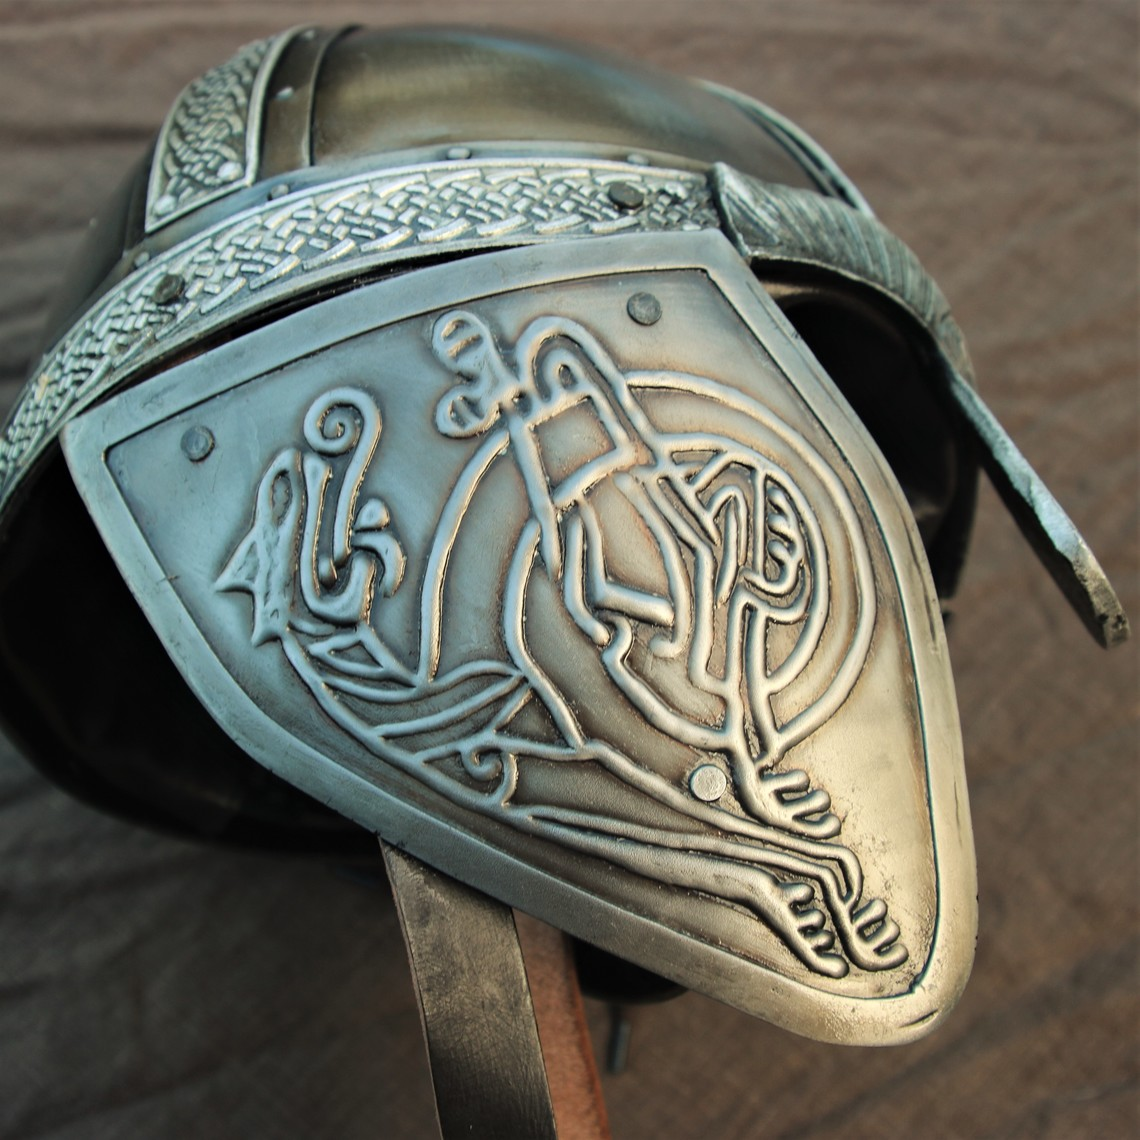 Windlass Steelcrafts Casco vikingo con los dragones